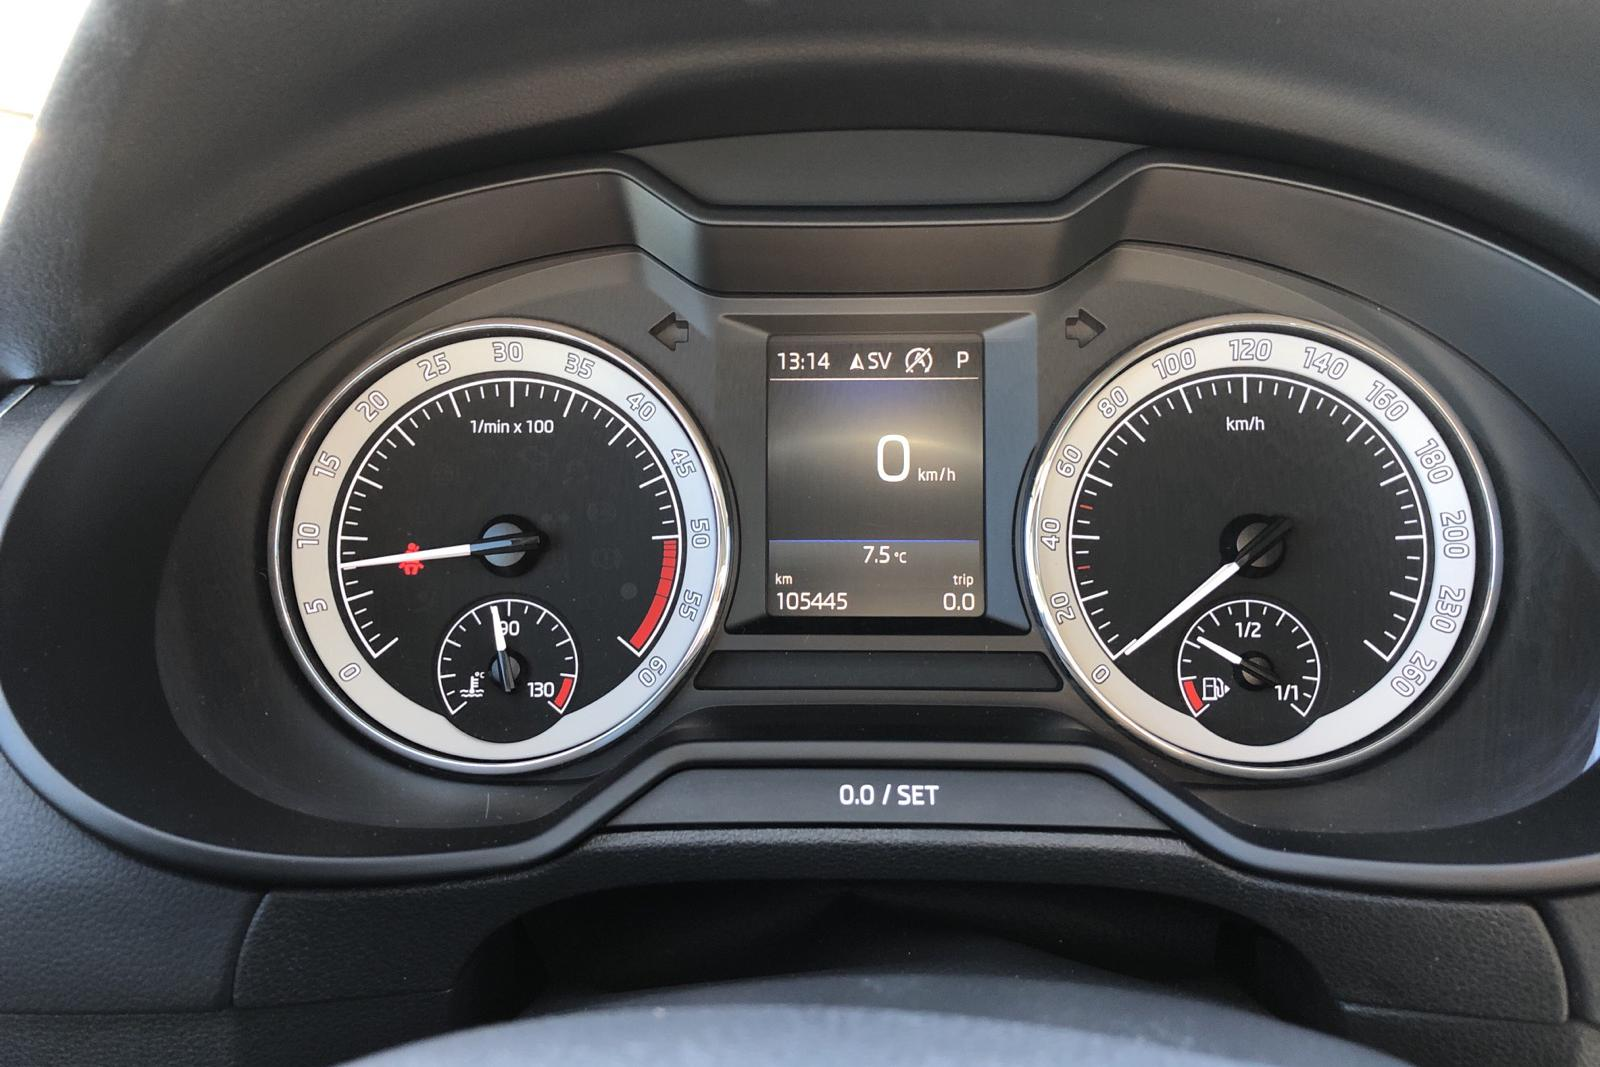 Skoda Octavia III 2.0 TDI Combi 4x4 (150hk) - 105 440 km - Automatic - silver - 2019